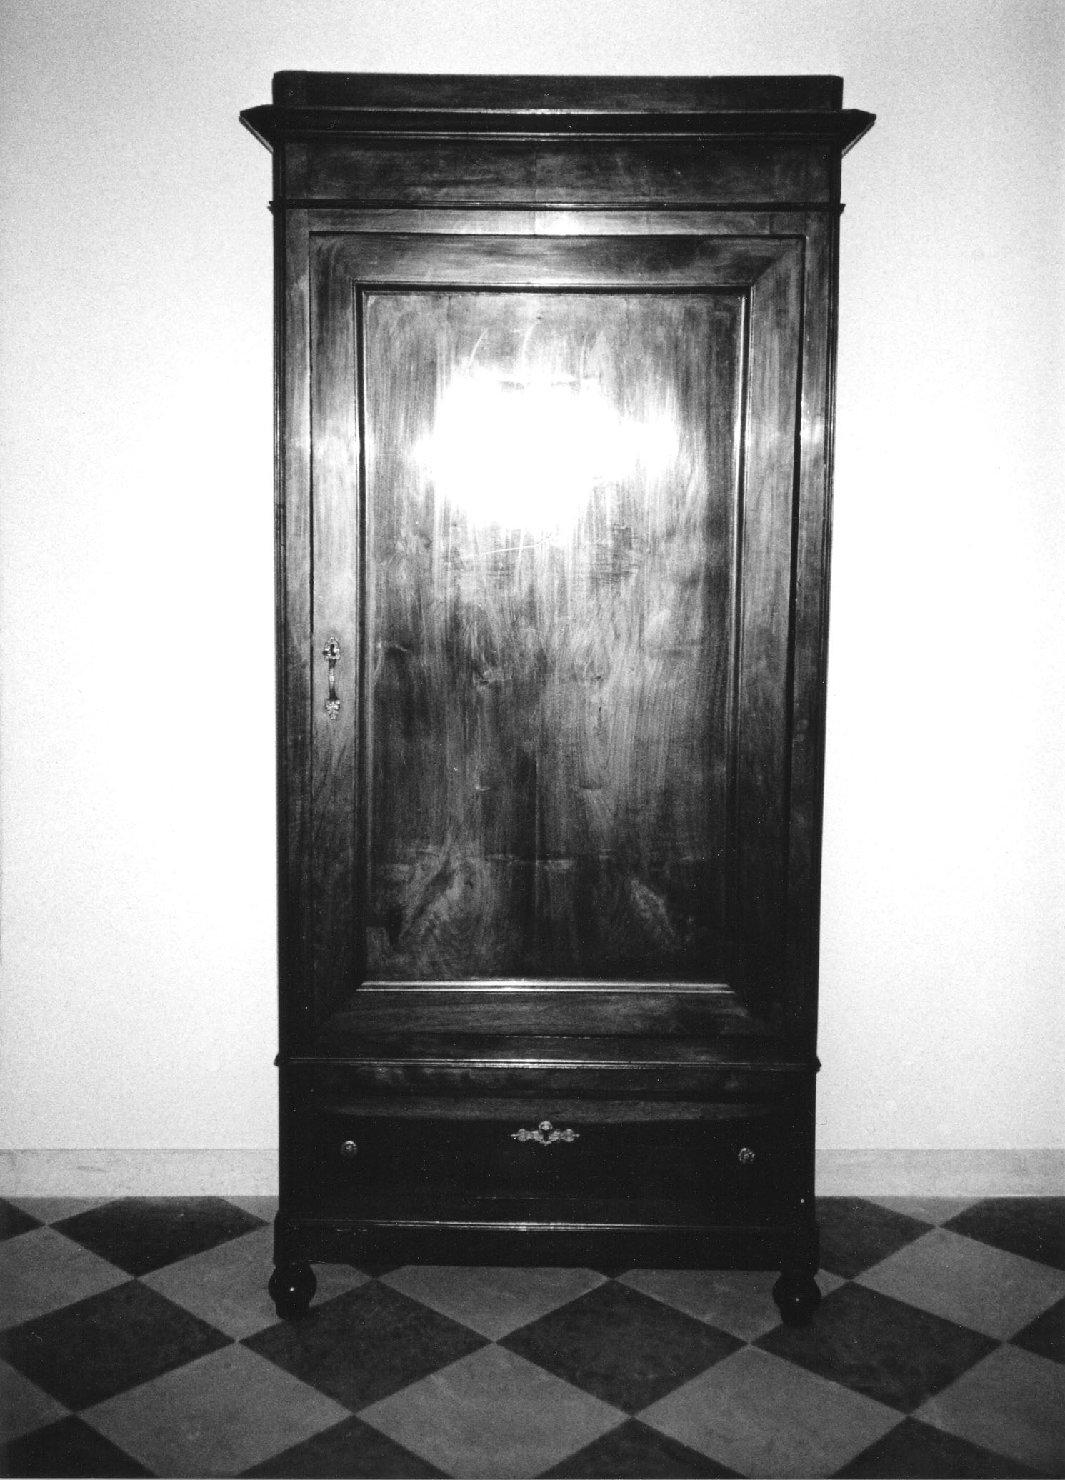 armadio, opera isolata - manifattura piemontese (sec. XIX)